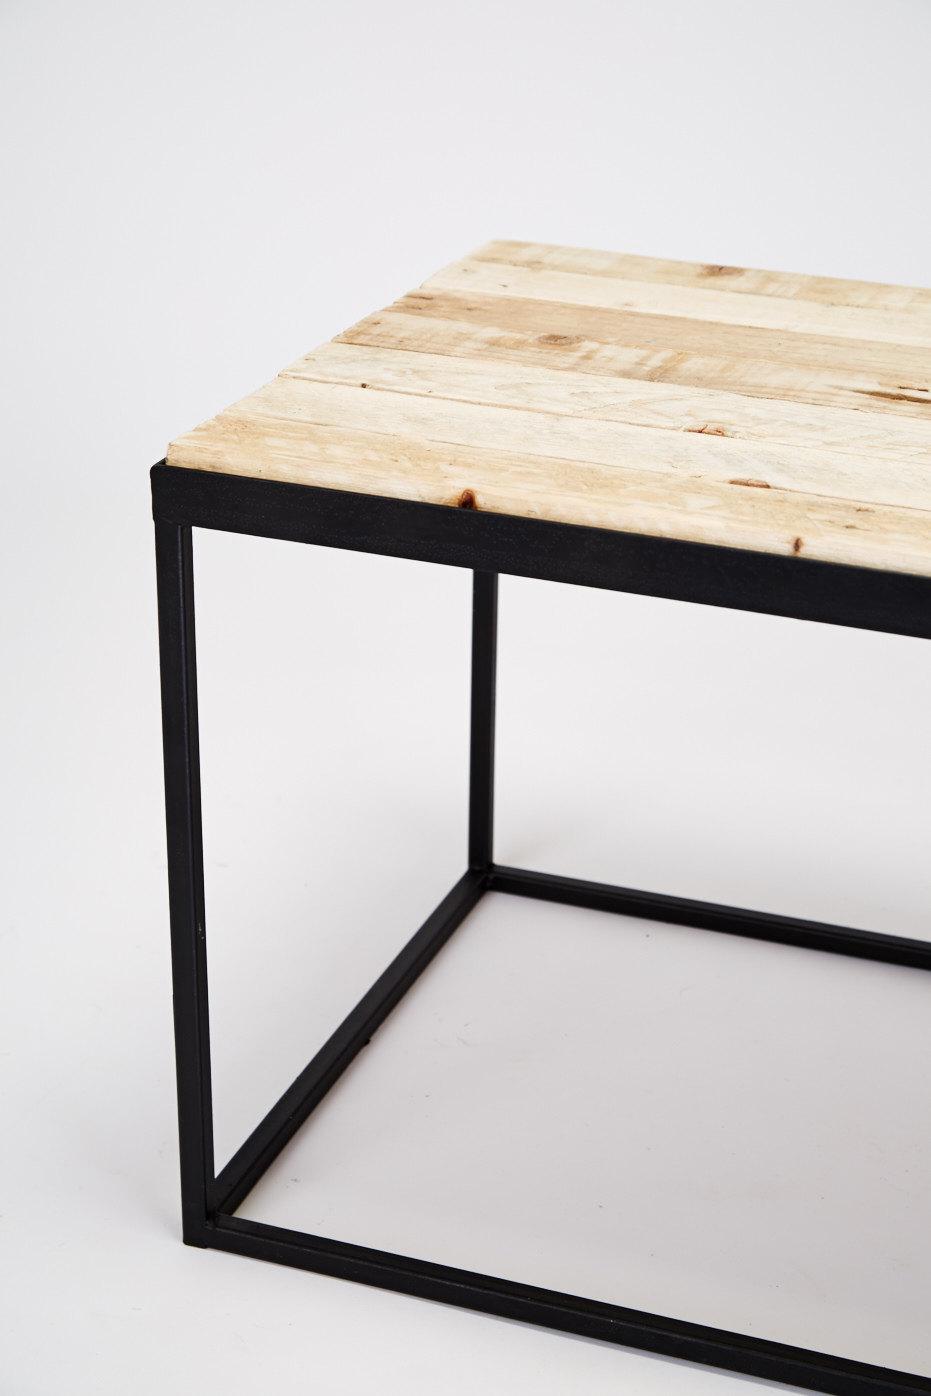 Reclaimed pallet-steel coffee table